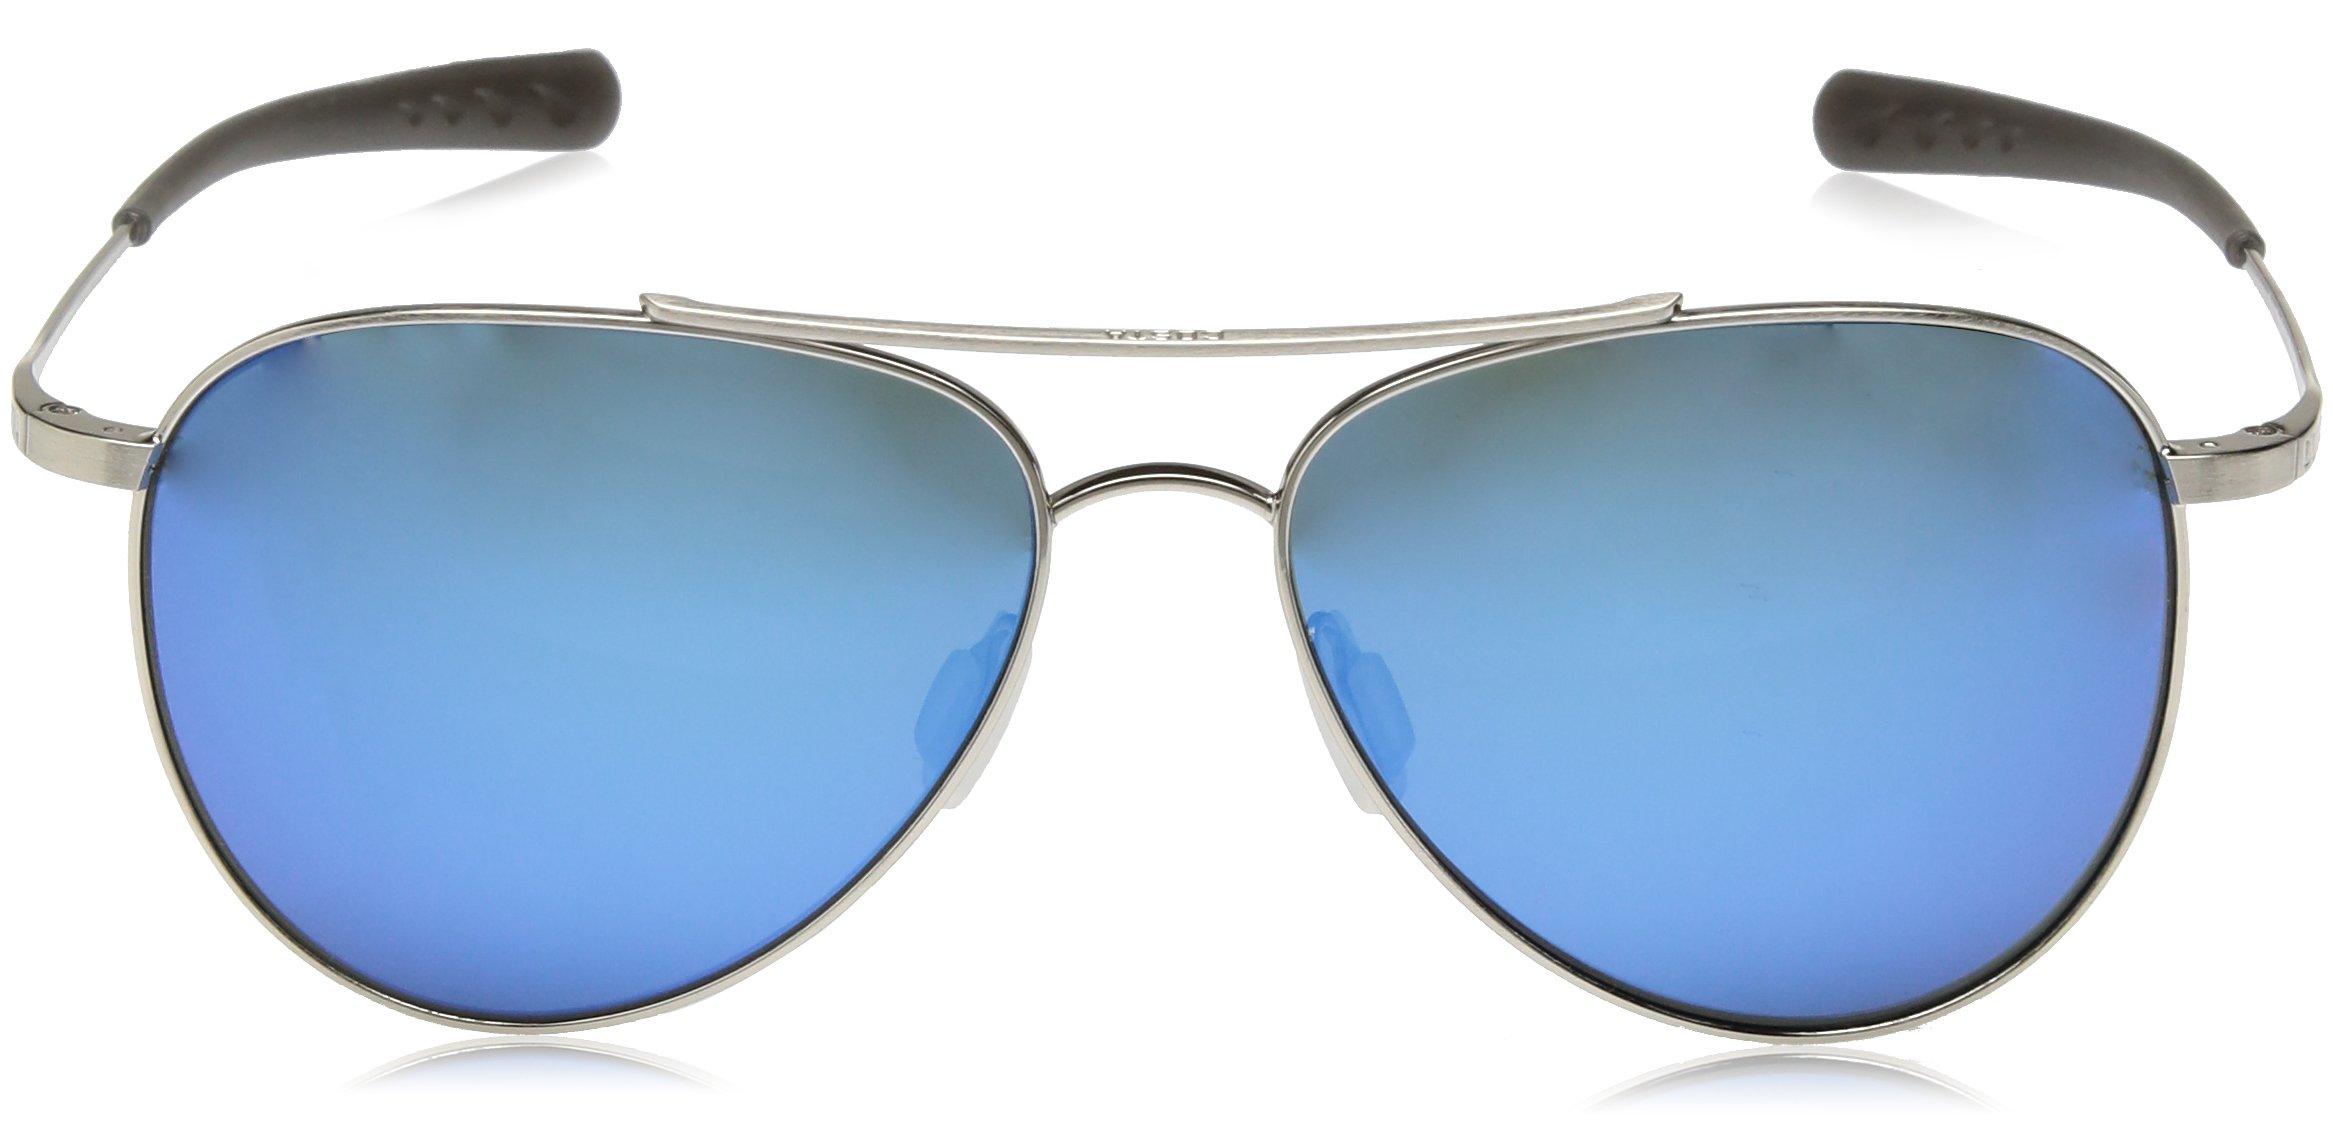 Costa del Mar Cook Polarized Iridium Aviator Sunglasses, Brushed Palladium, 59.7 mm by Costa Del Mar (Image #2)